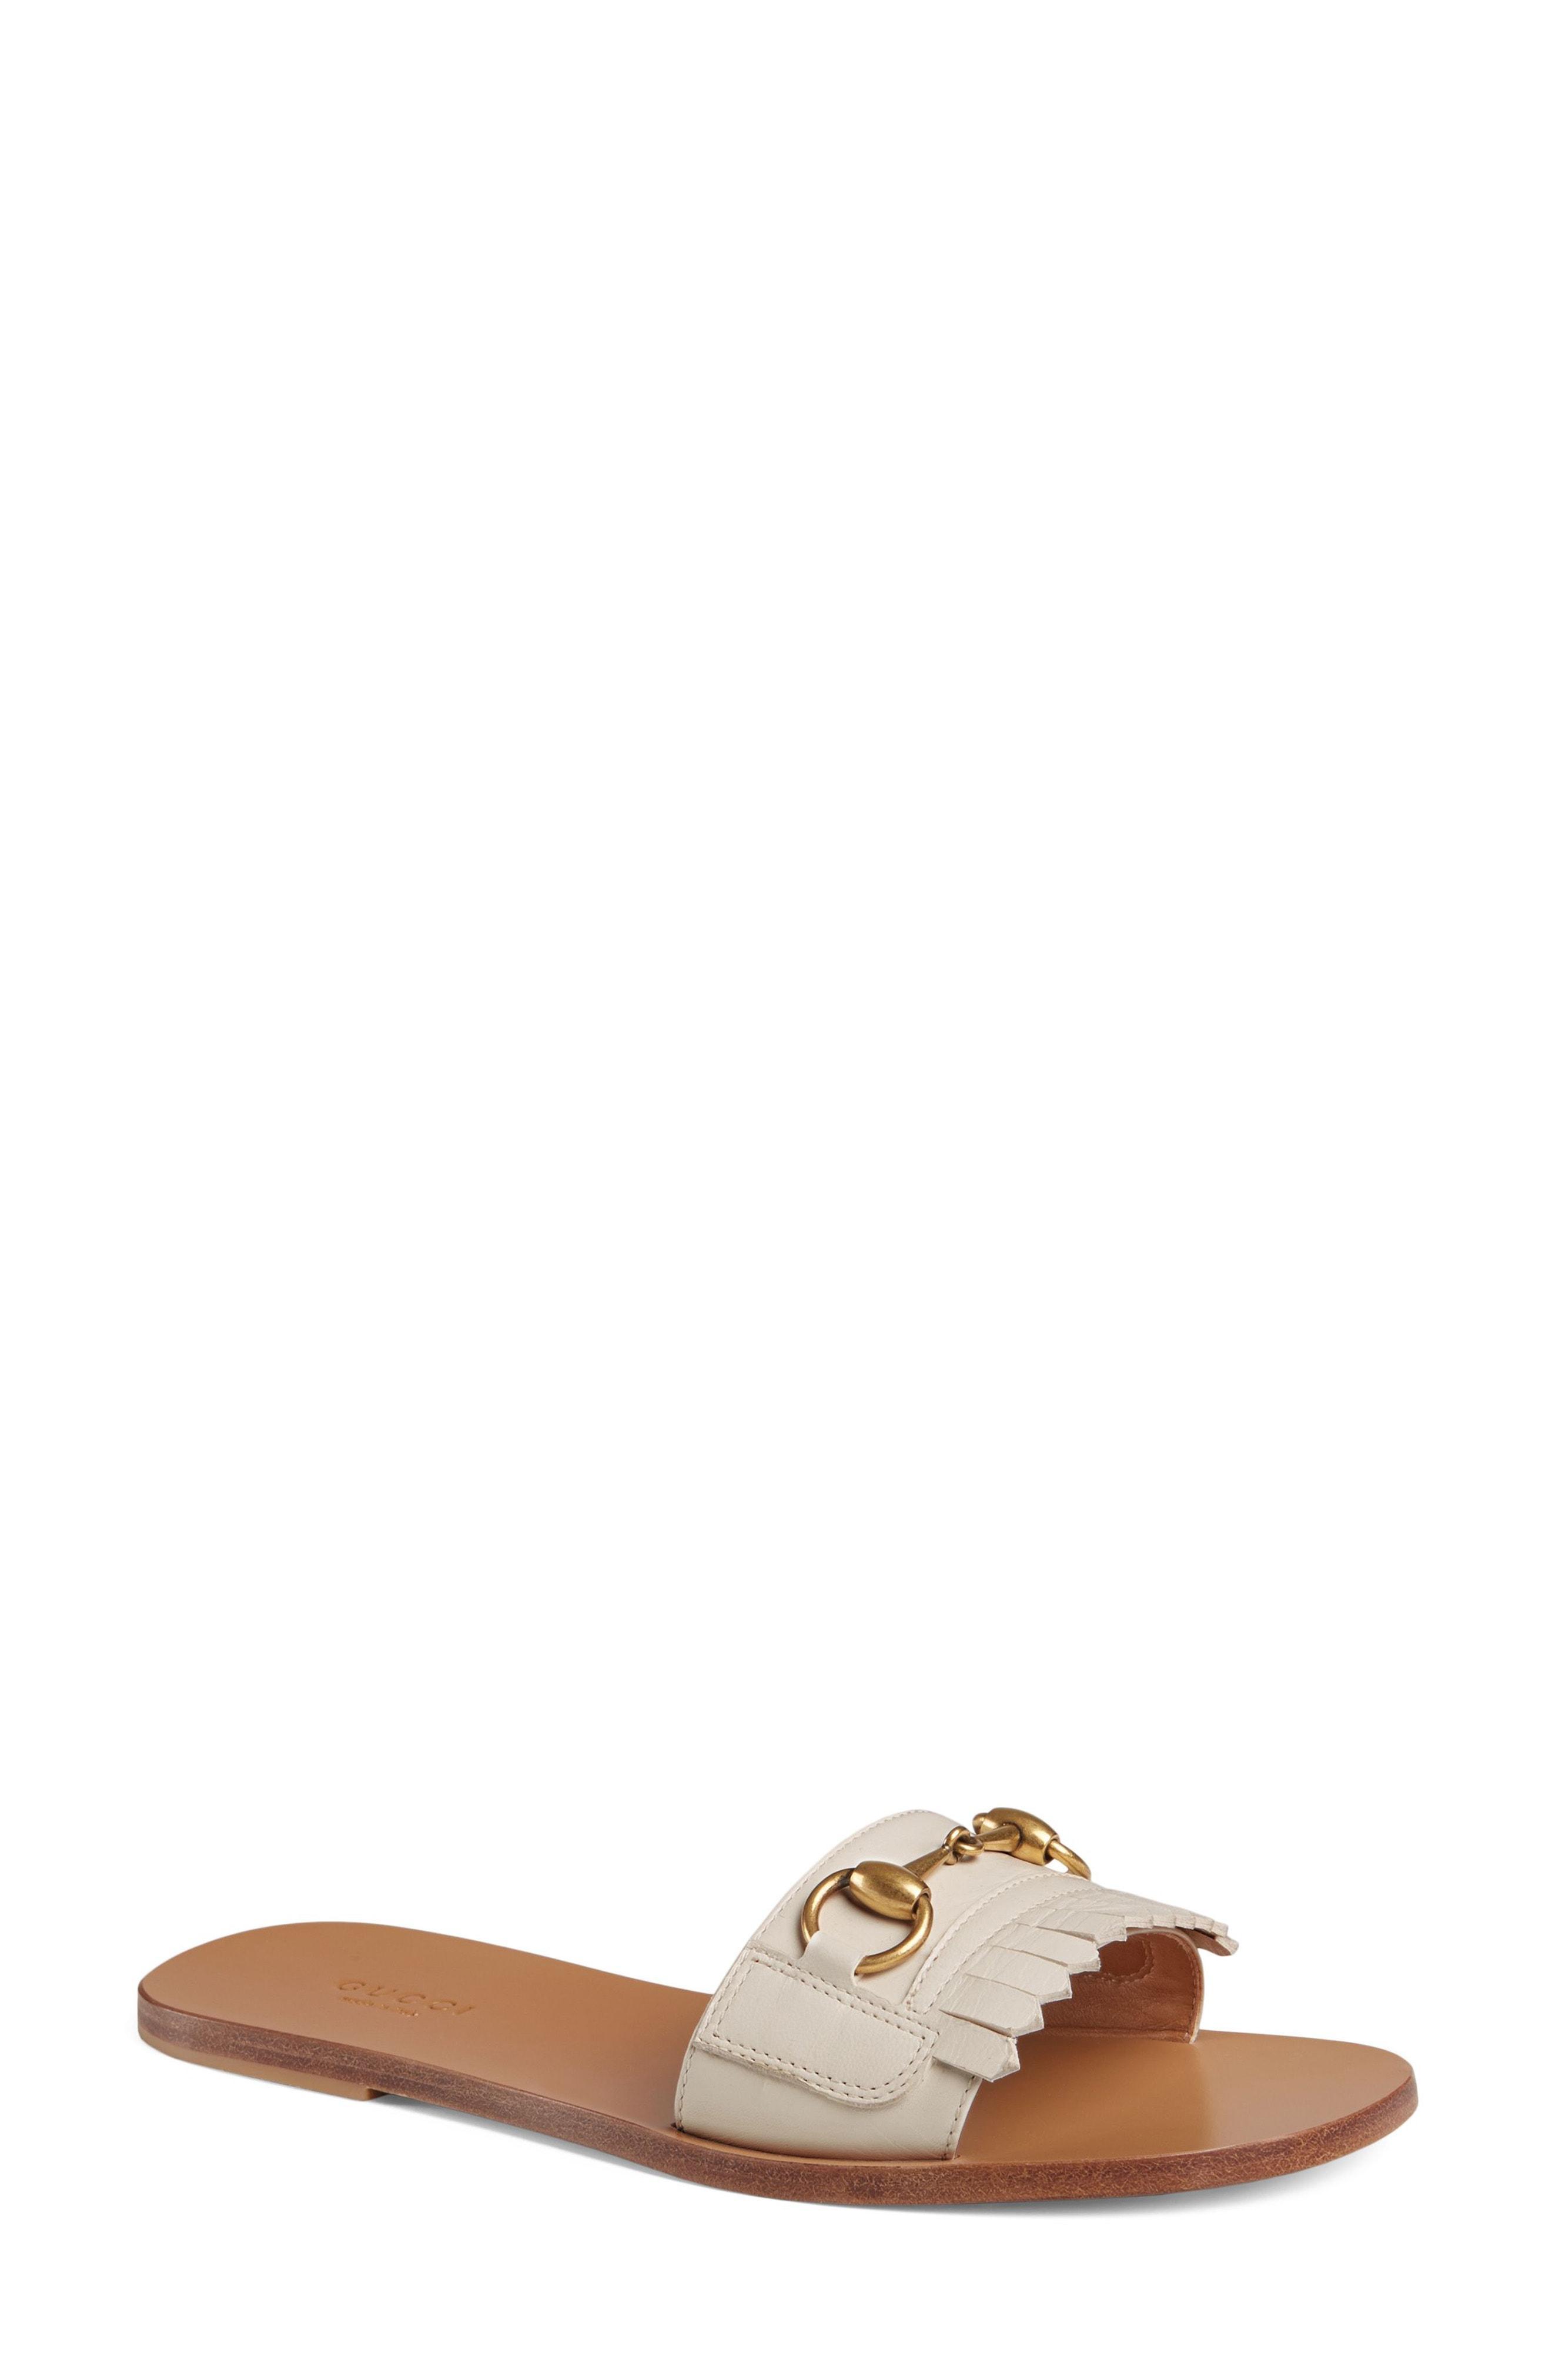 9d6306118 Gucci Women s Varadero Fringe Leather Slide Sandals In 9110 White ...